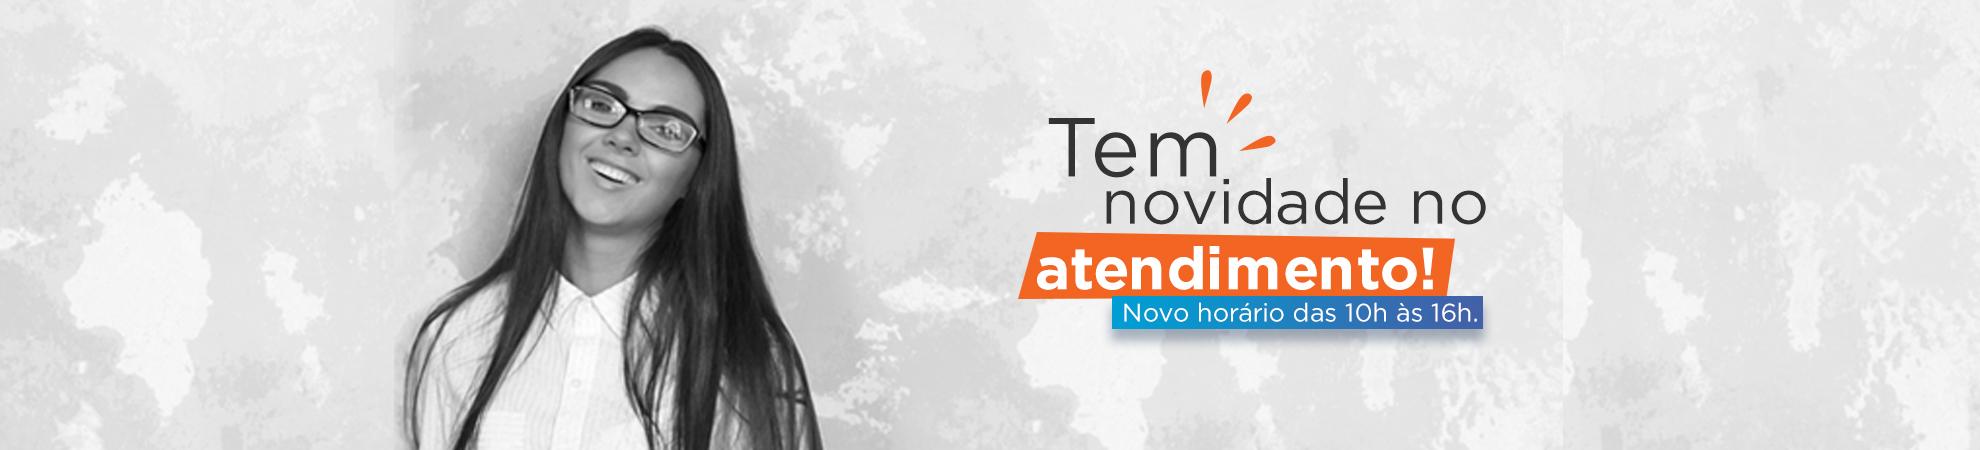 banner_atendimento_pagina